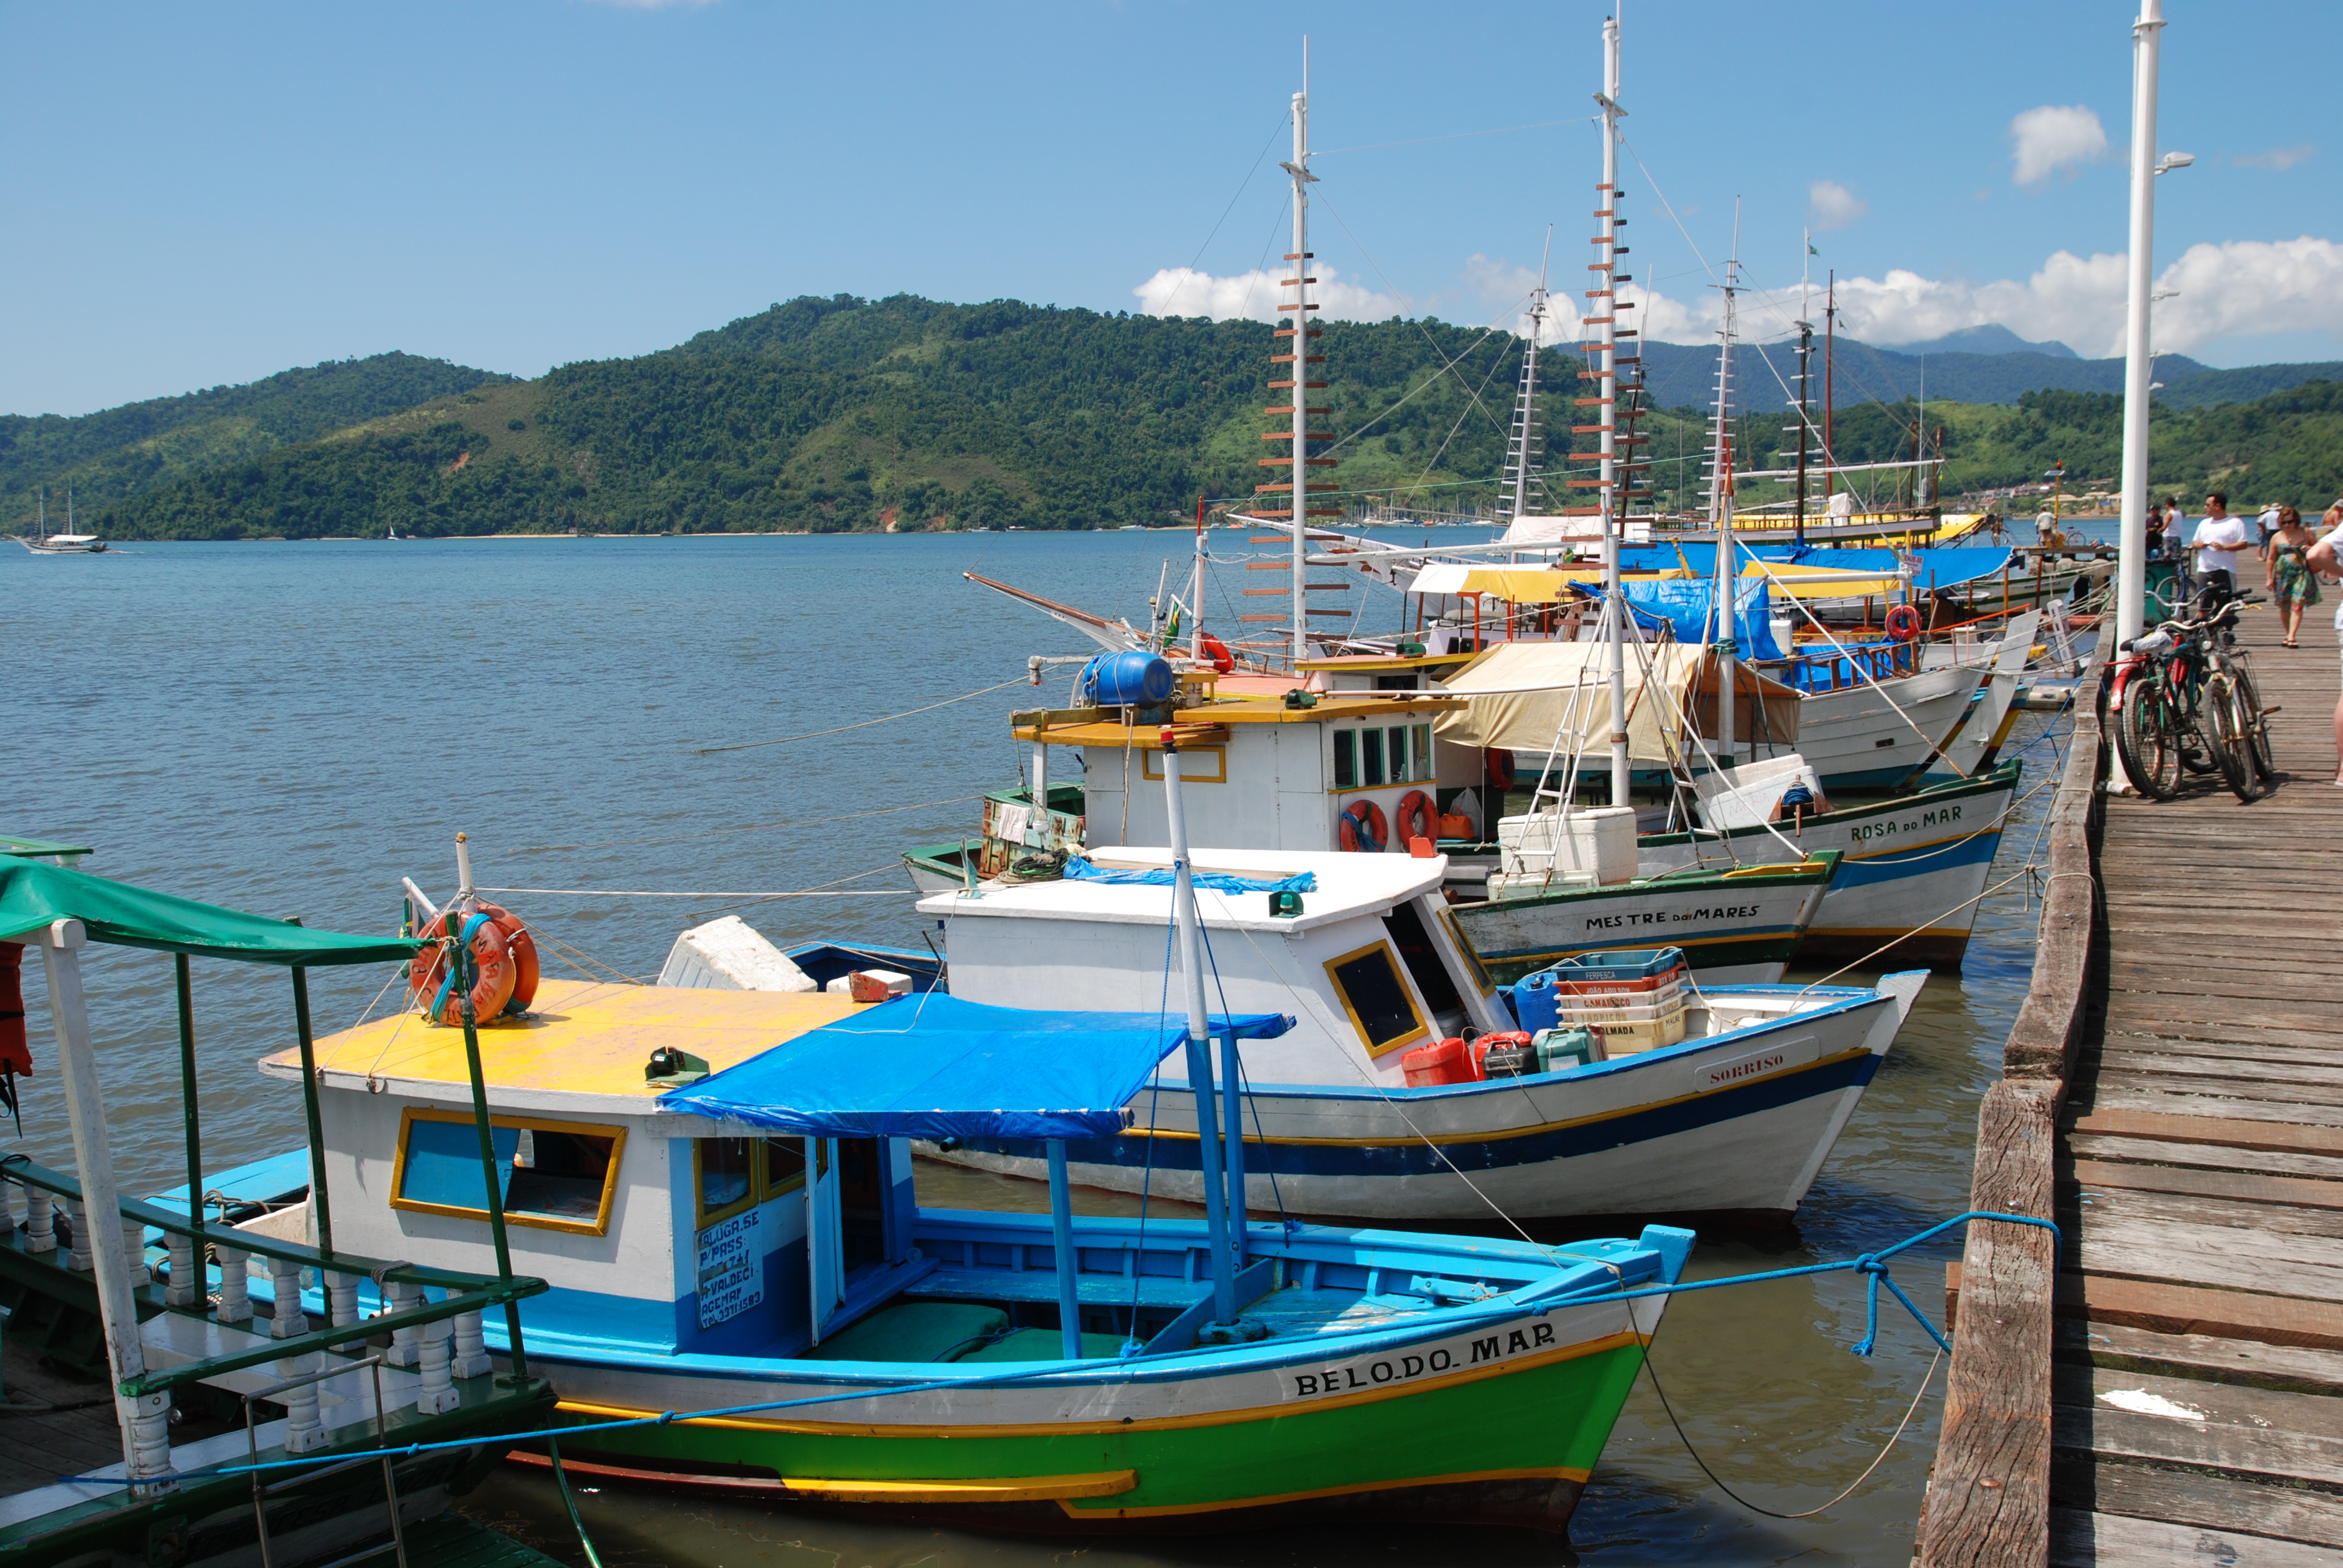 Brazil_paraty_harbour_boats.jpg